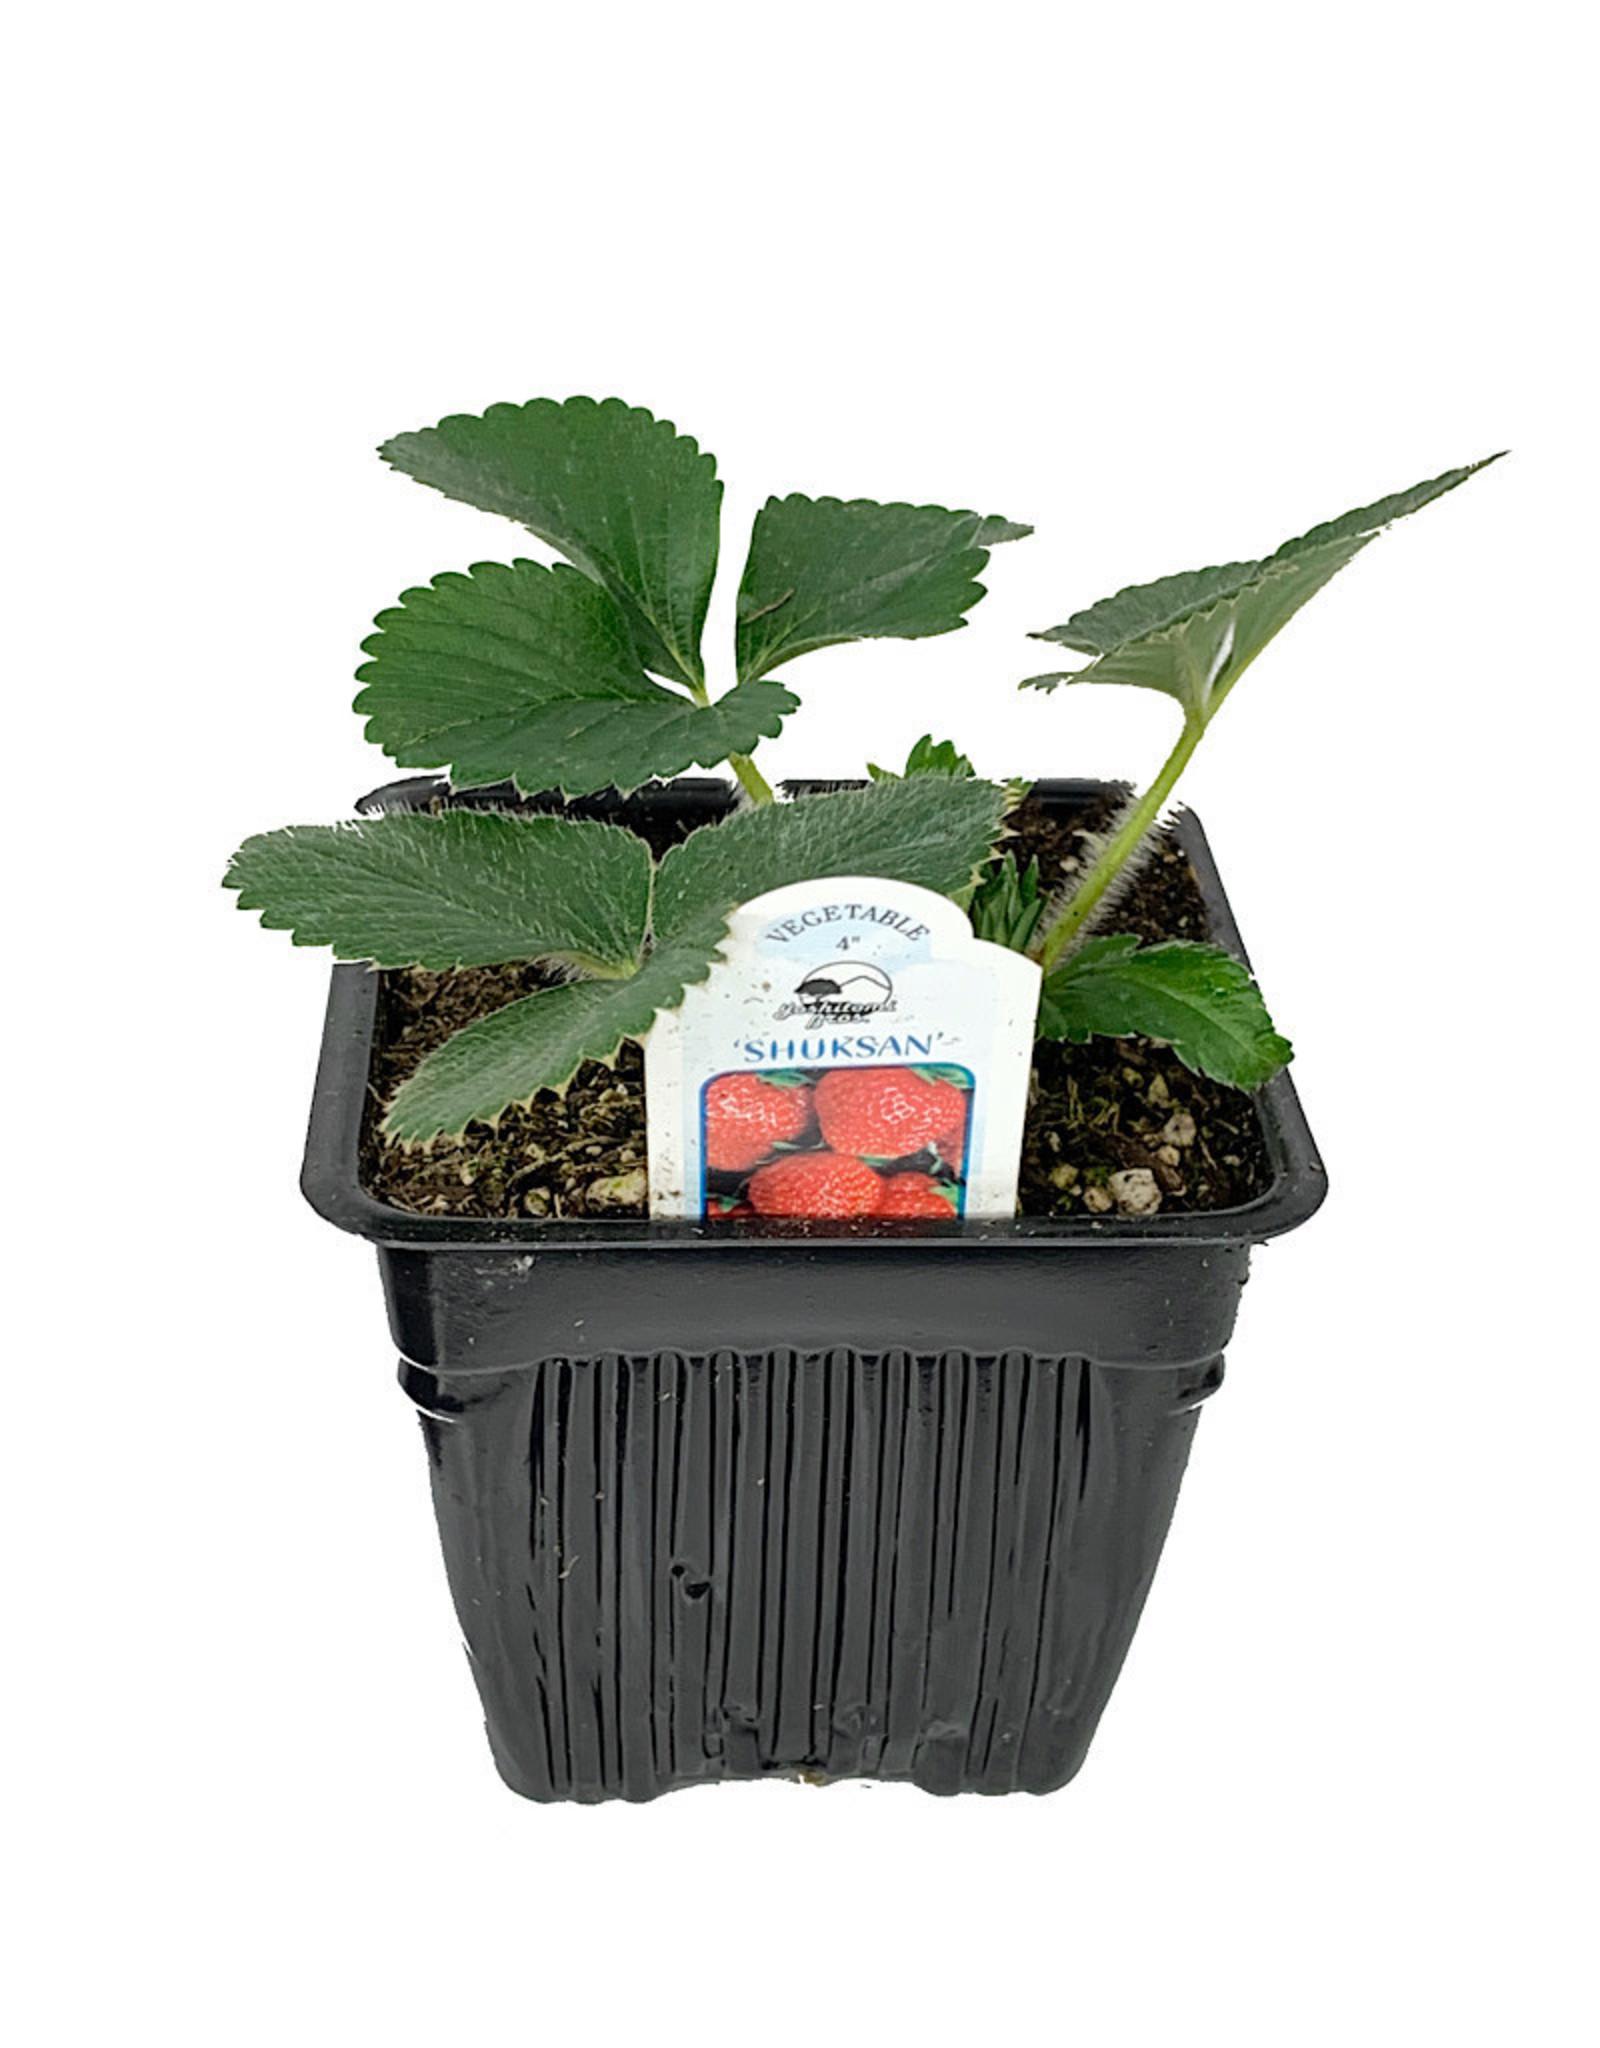 Strawberry 'Shuksan' - 4 inch